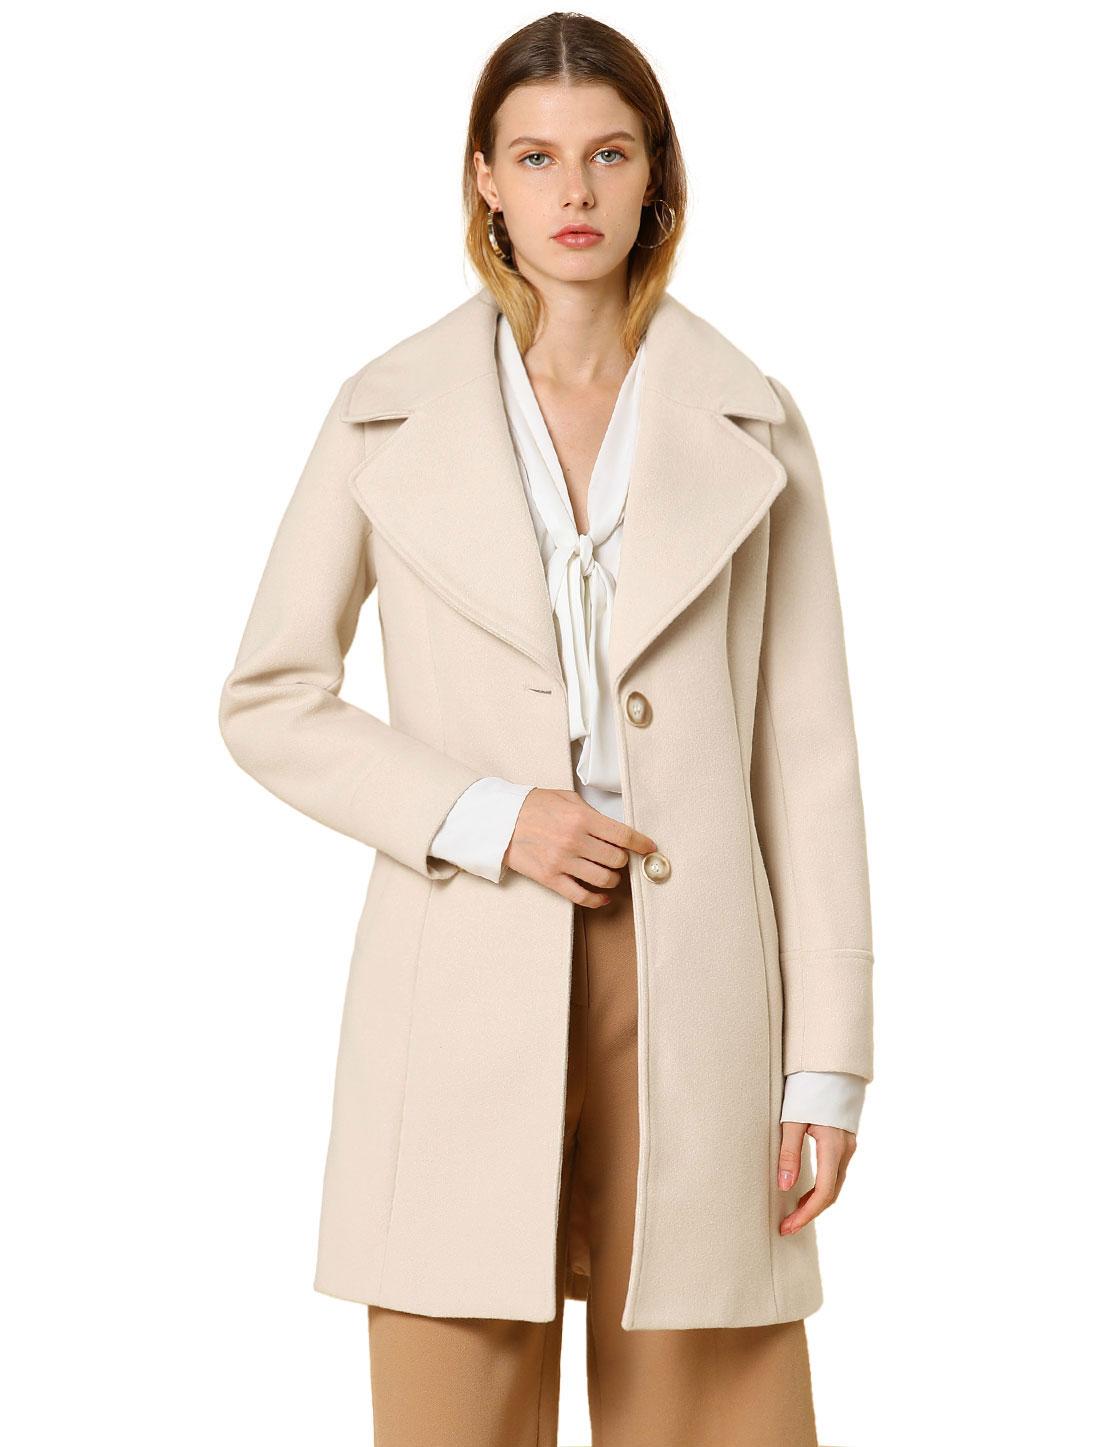 Allegra K Women's Elegant Notched Lapel Button Winter Trench Coat Off-White XS